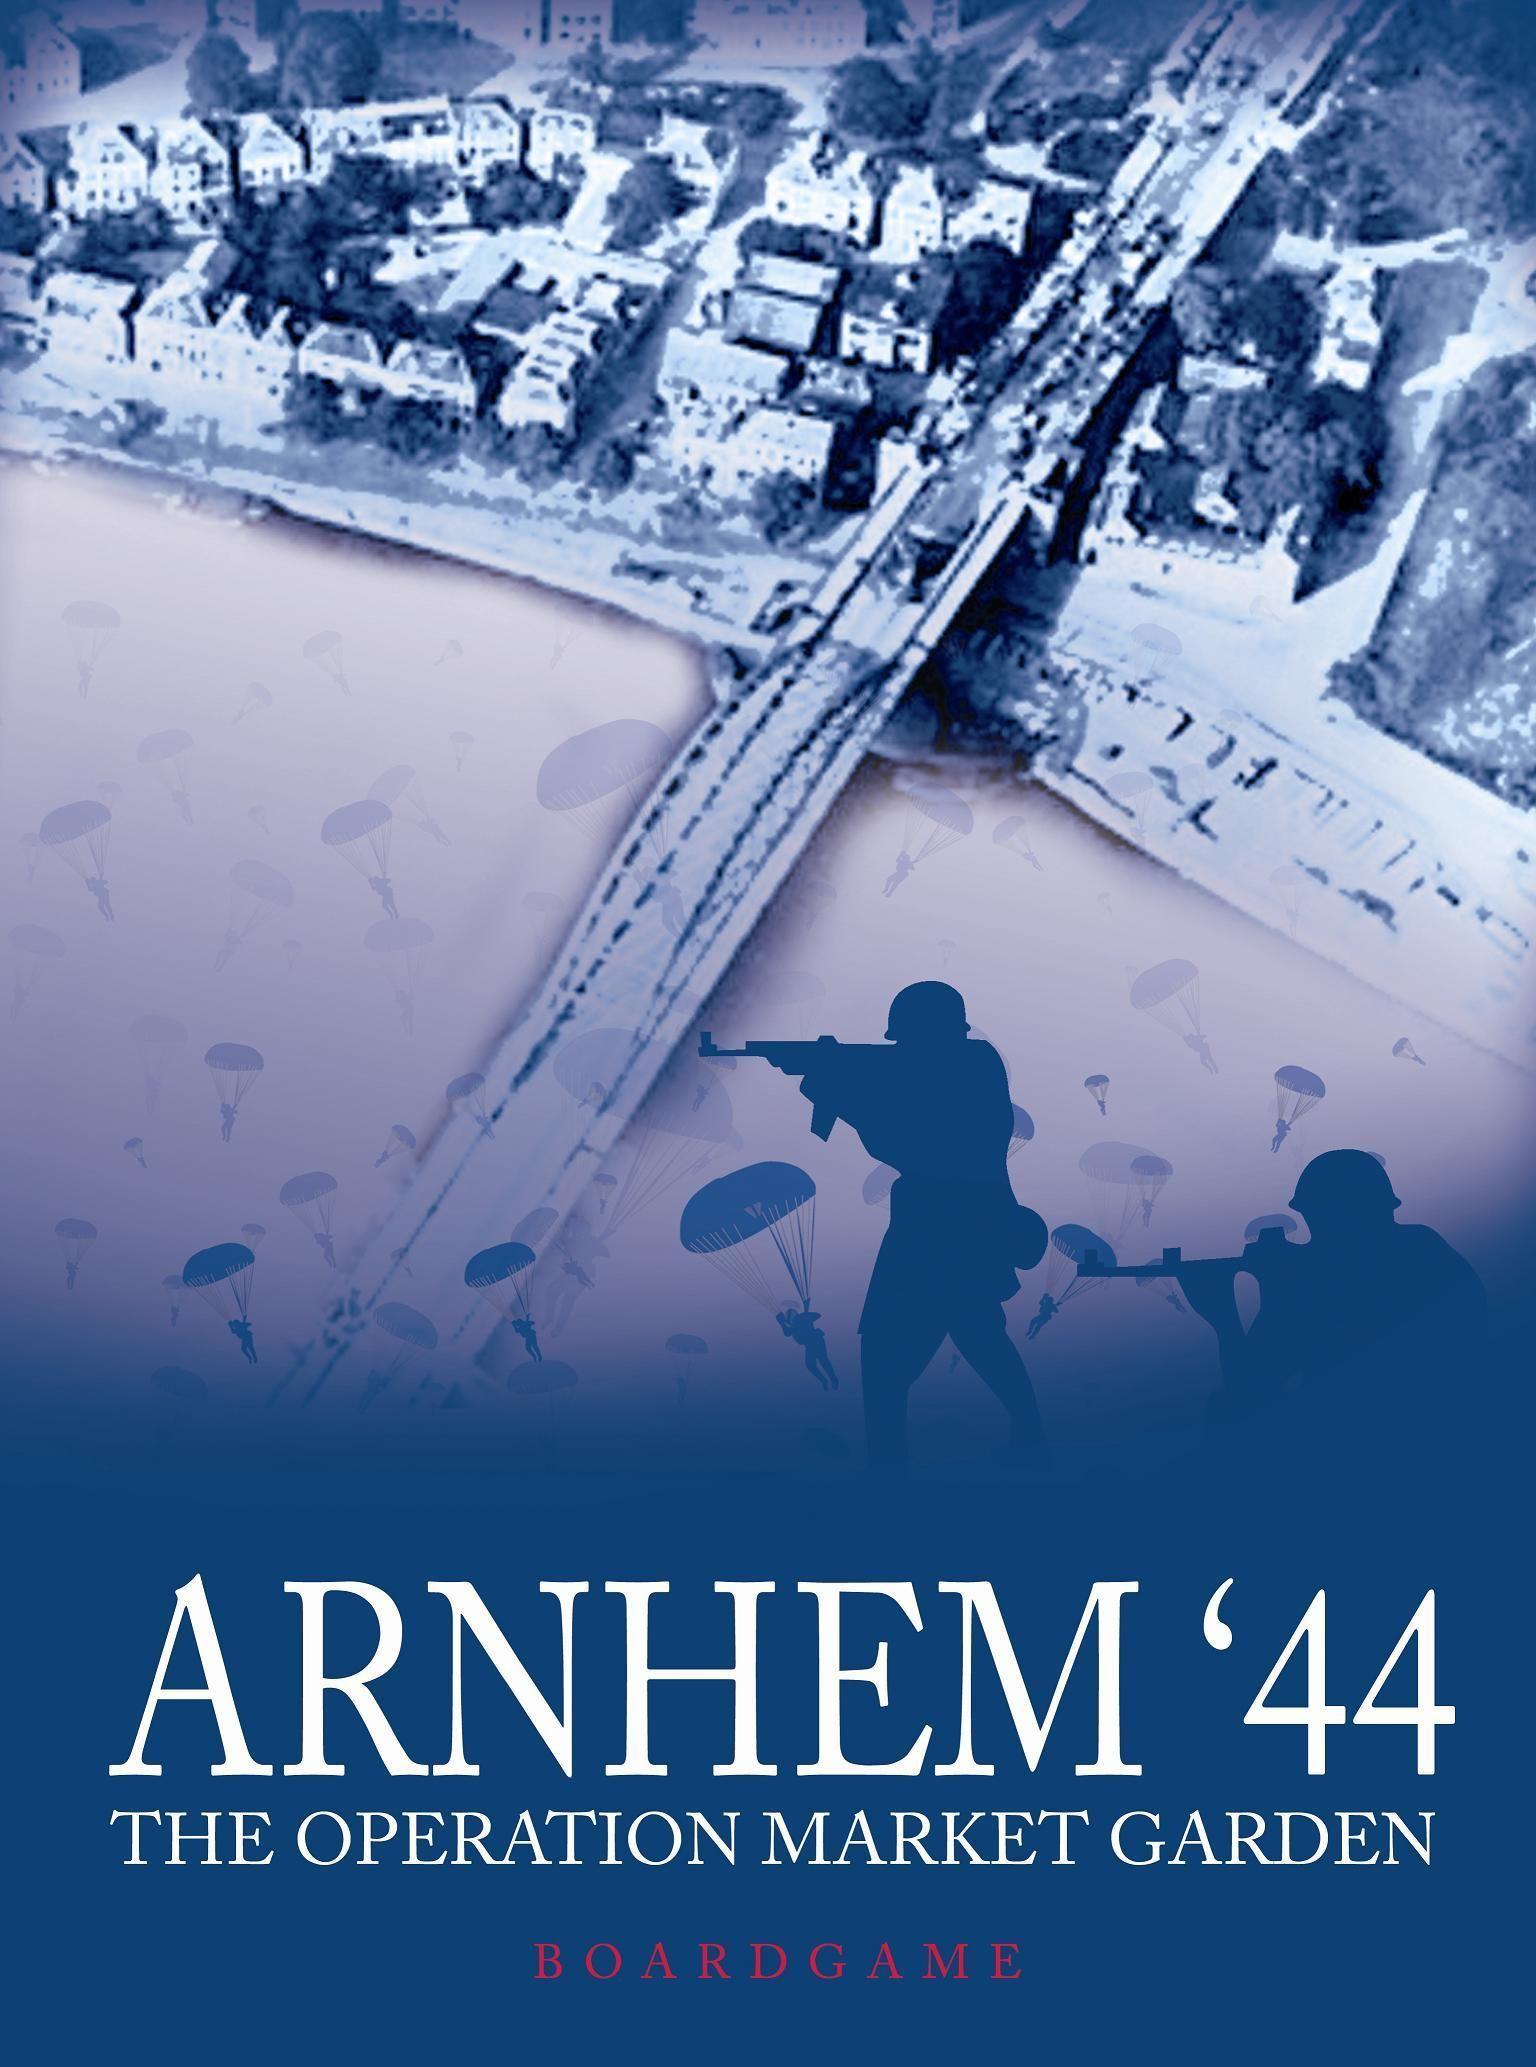 настольная игра Arnhem '44: The Operation Market Garden Boardgame Арнем '44: Операция Market Garden Boardgame